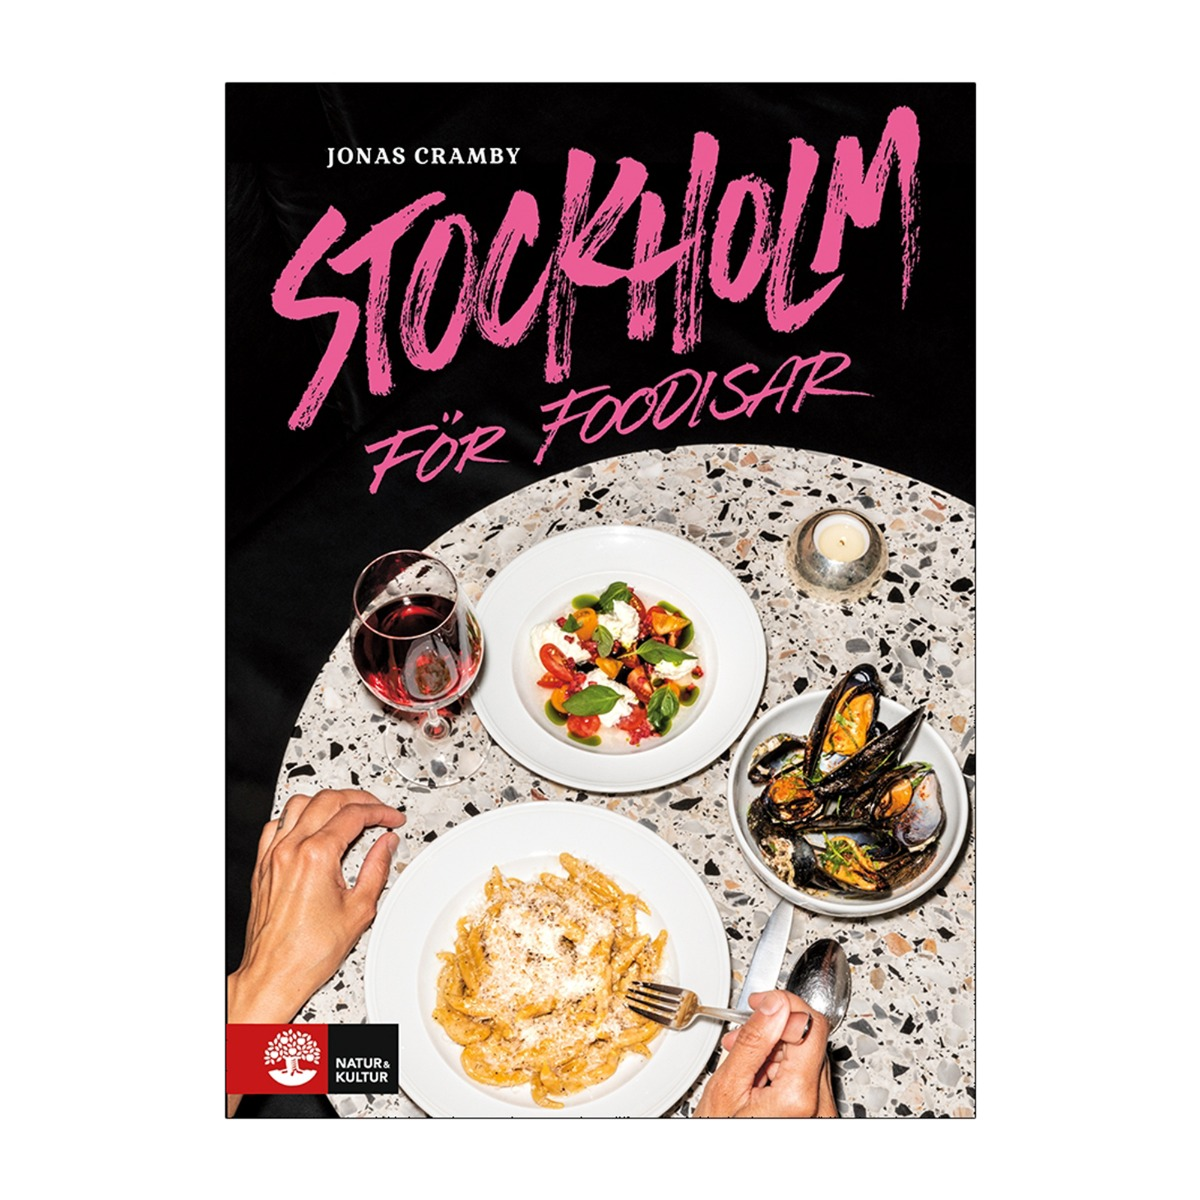 Designtorget Bok Stockholm för Foodisar